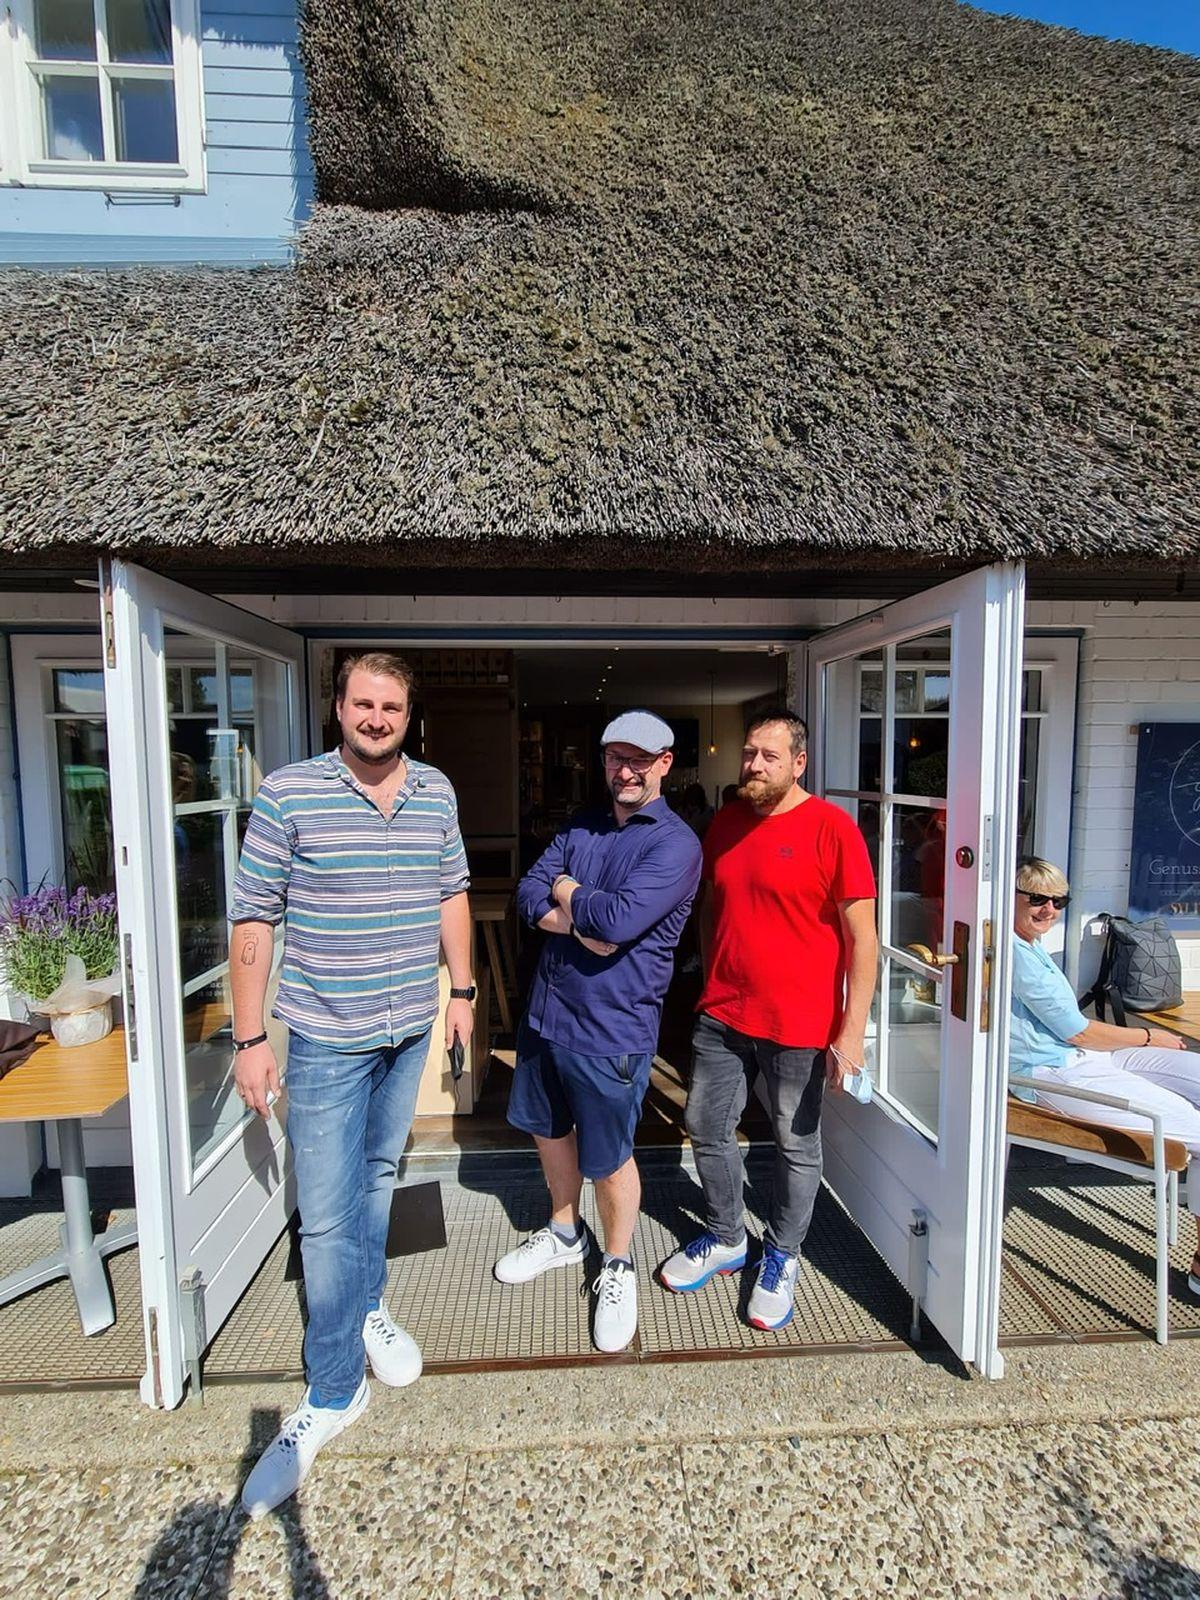 Simon Kopp, Stephan Wagner und Mario Schober, Geschäfsführer GenussKontor Sylt